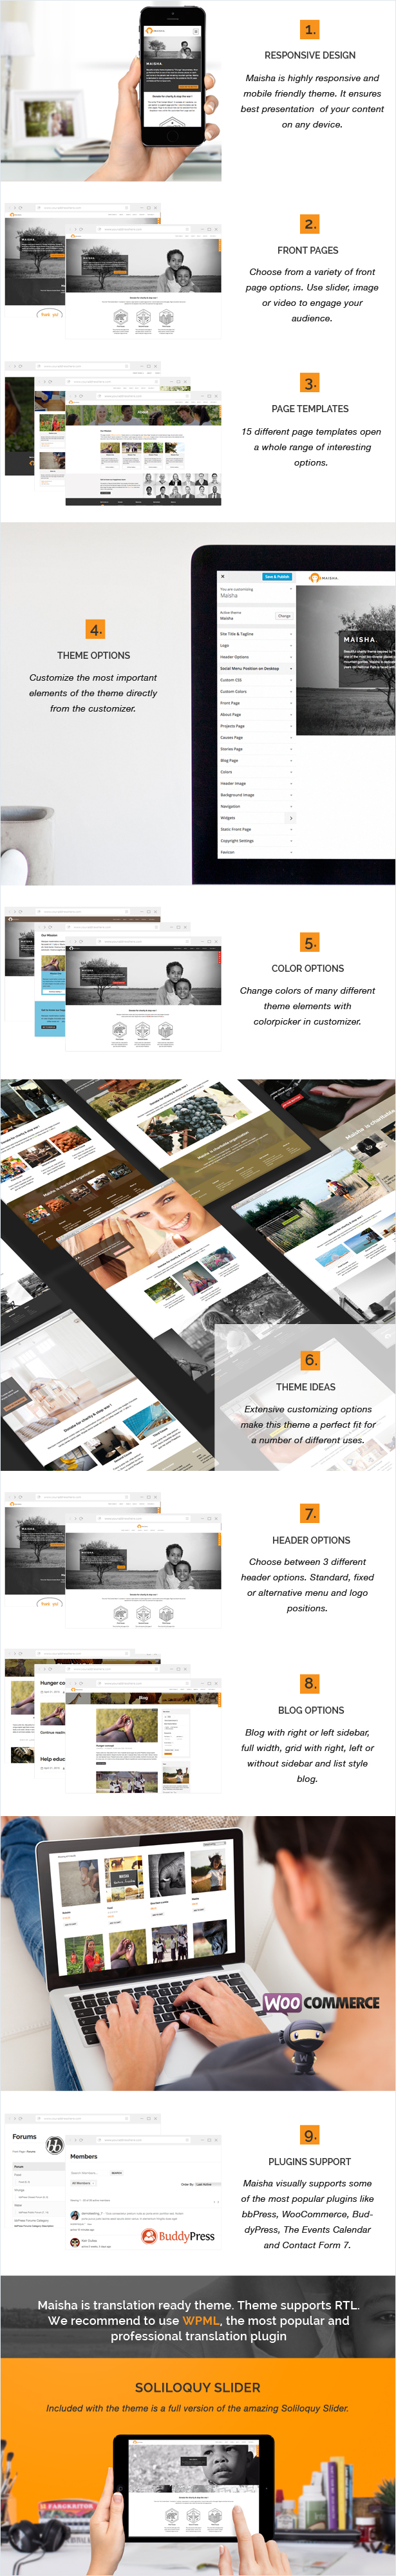 WordPress theme Maisha - Charity/Non-Profit WordPress Theme (Charity)